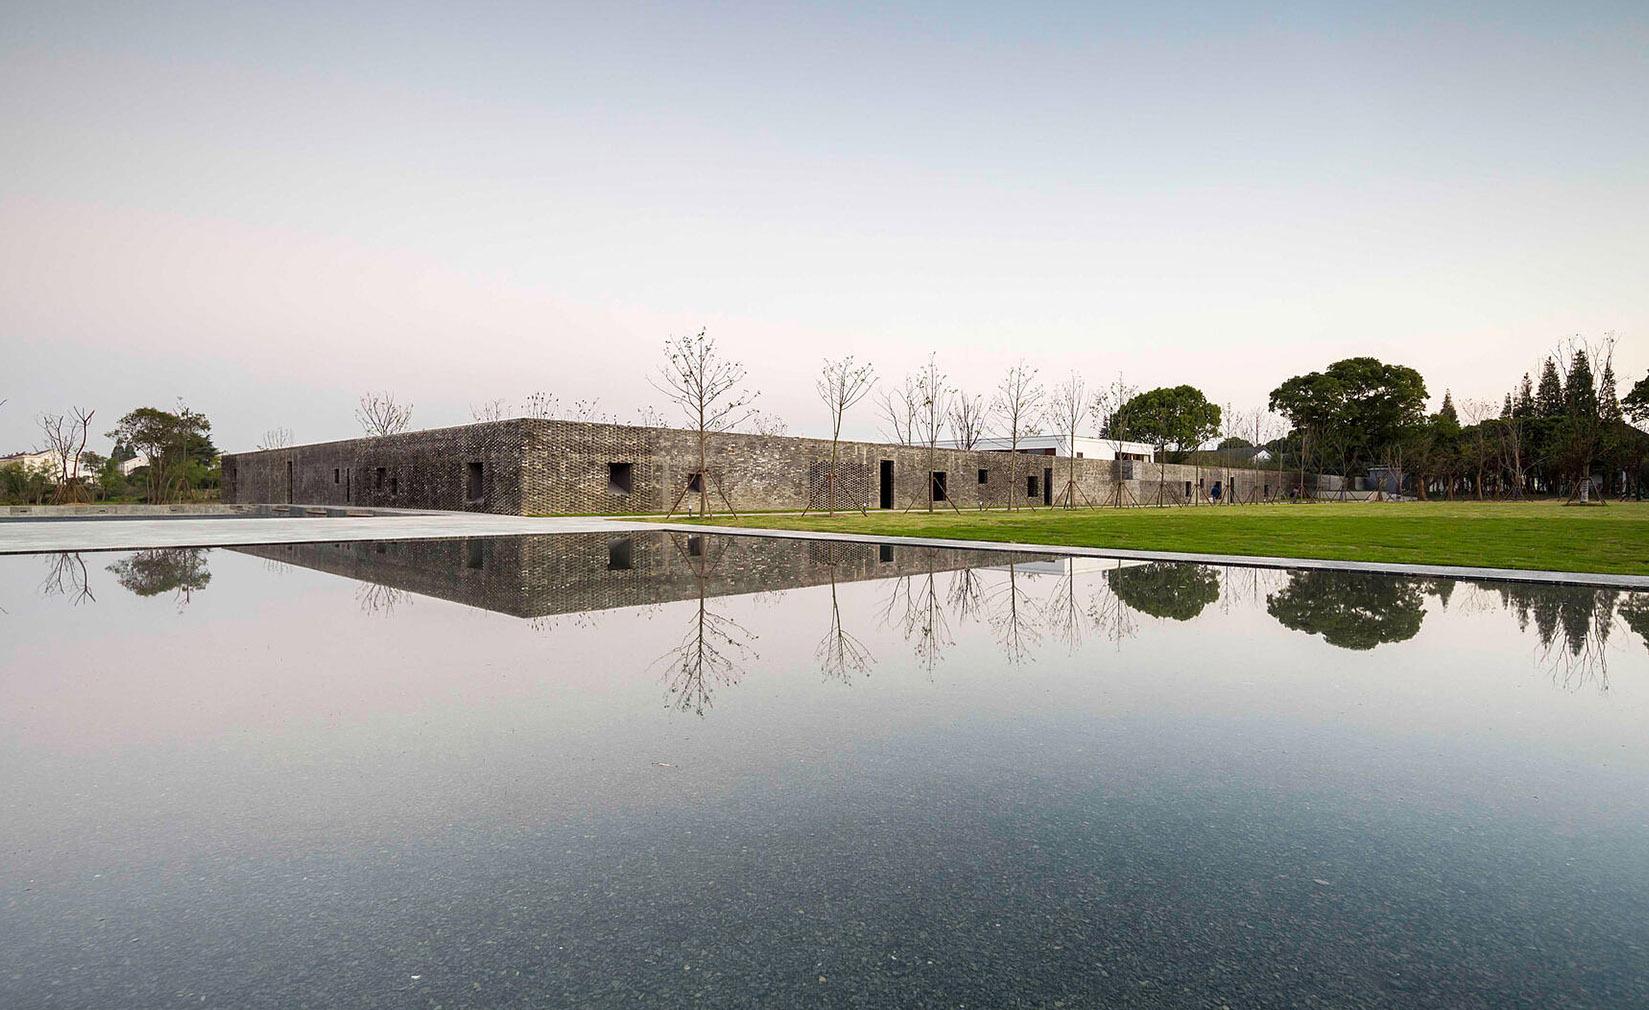 The Walled Tsingpu Yangzhou Retreat